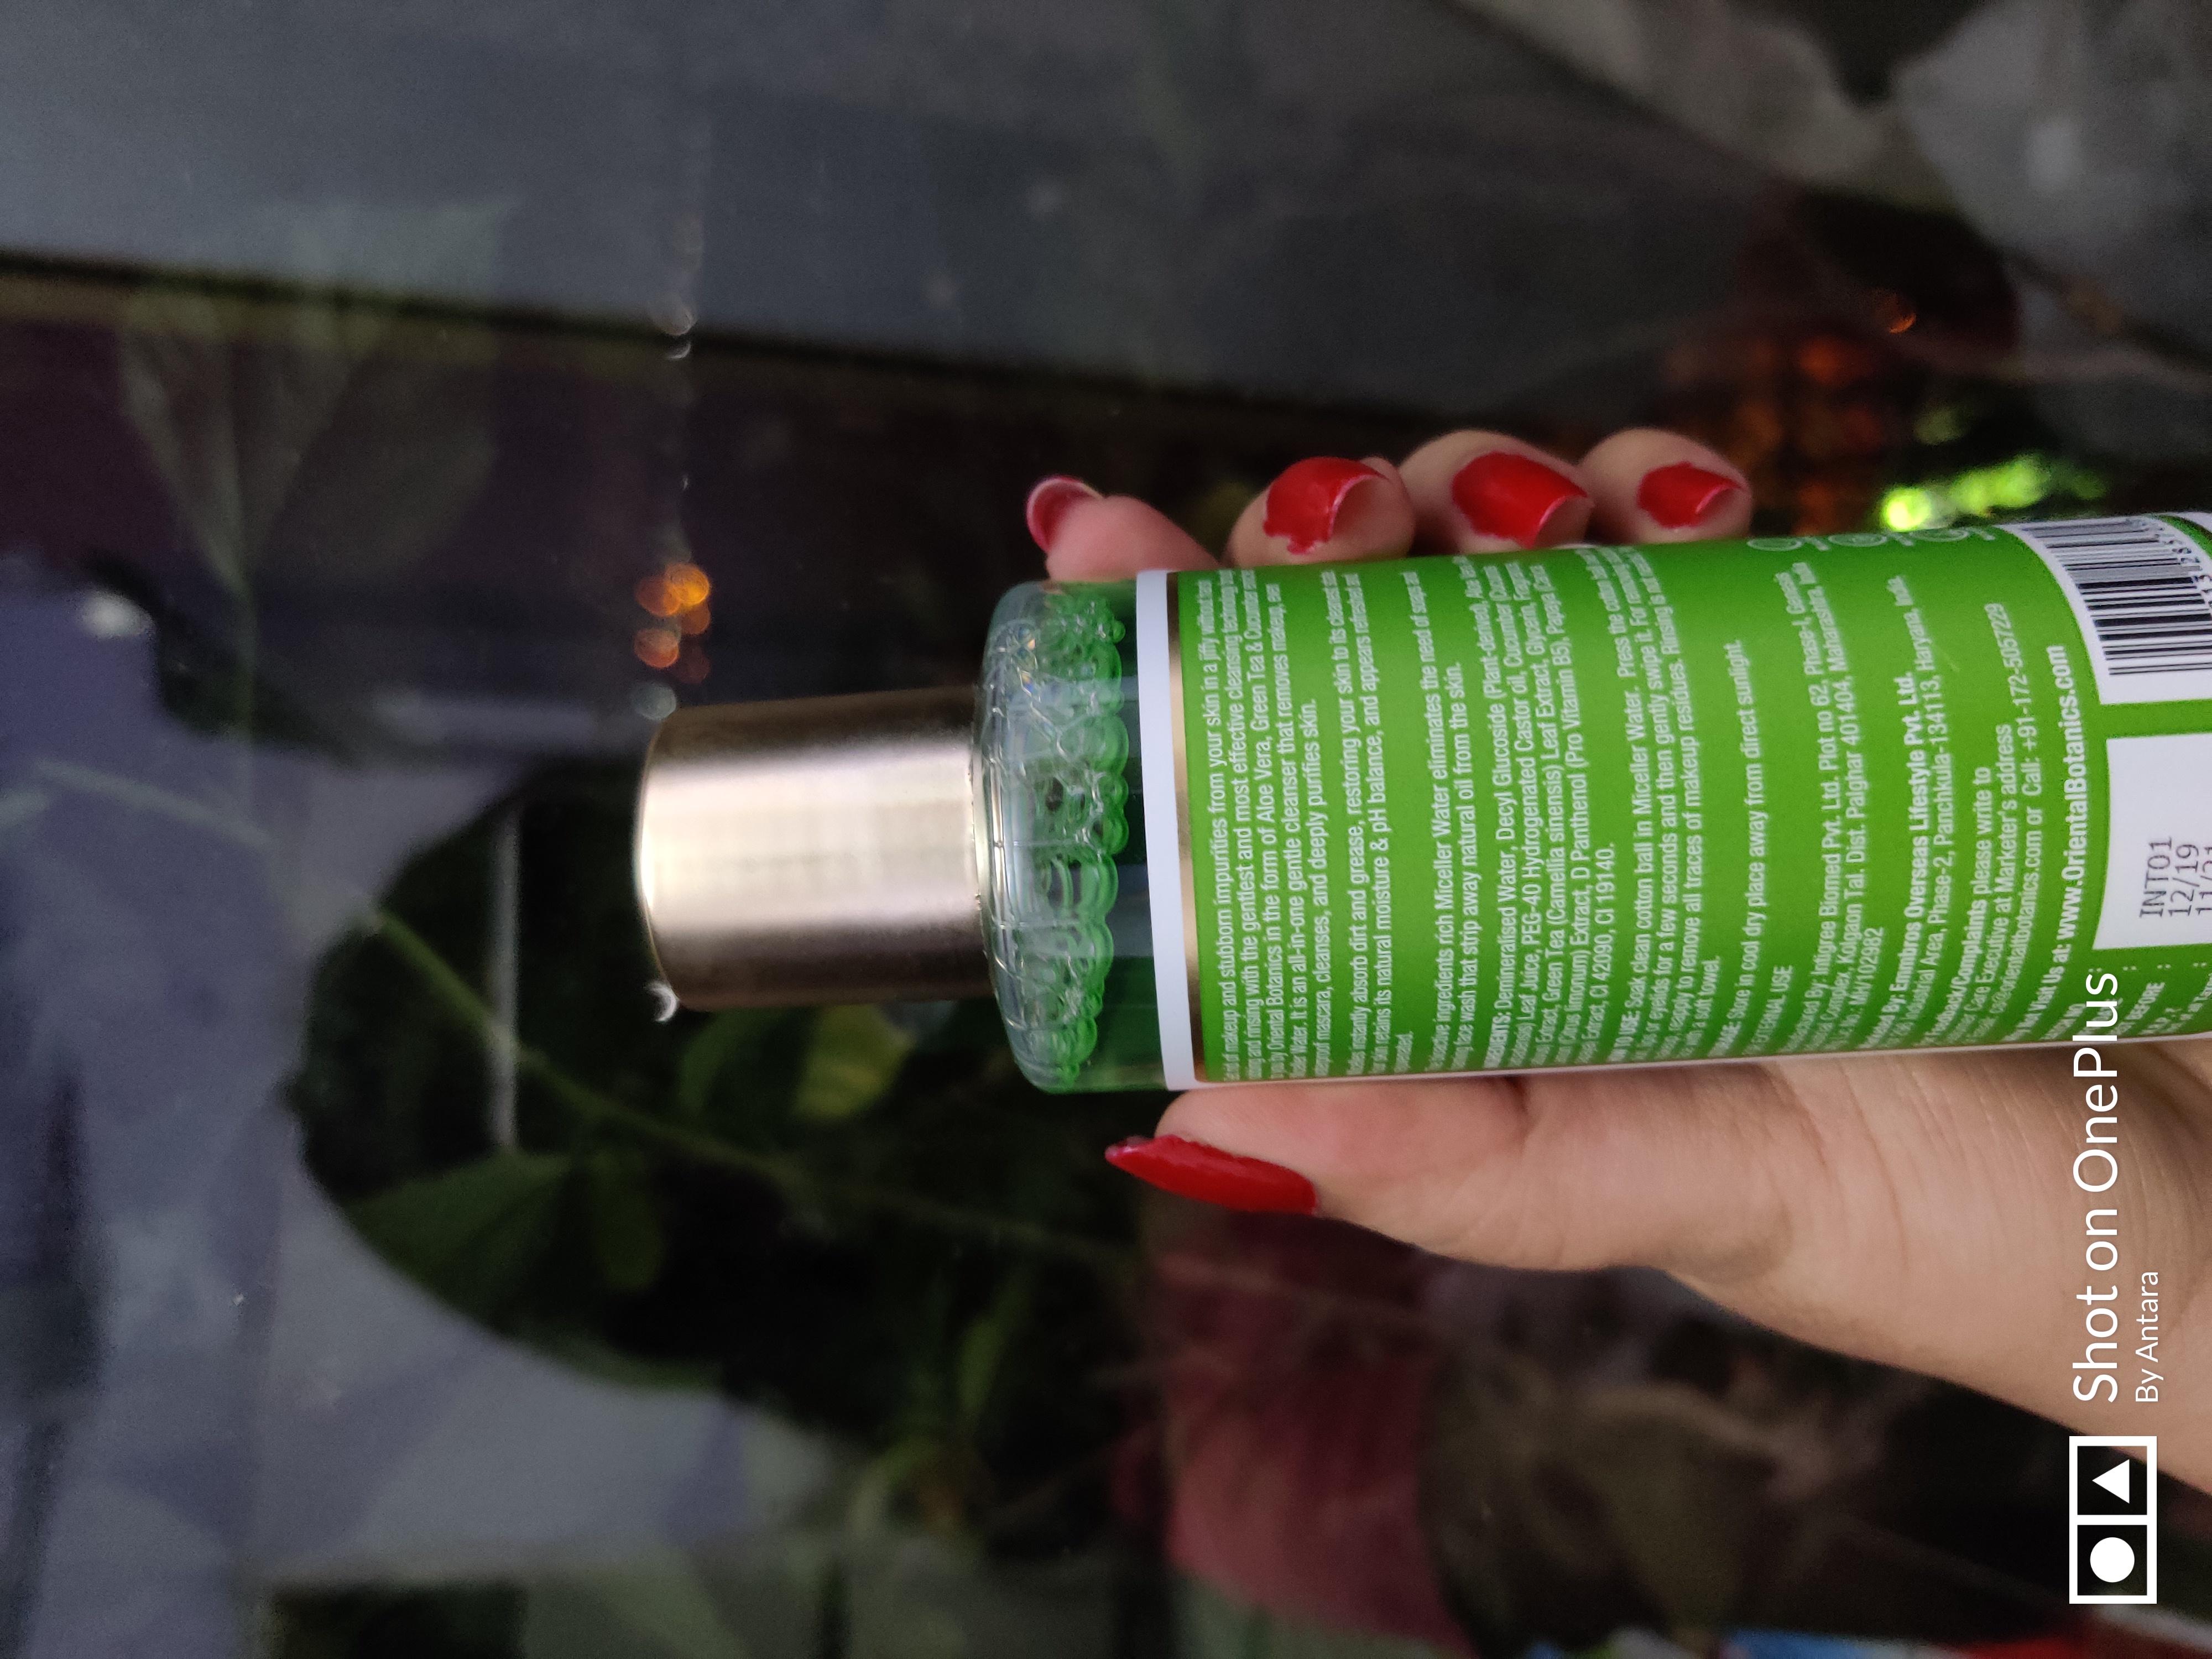 Oriental Botanics Aloe Vera, Green Tea & Cucumber Micellar Water-It is veey gentle on skin, nice fragrance-By kitchenjungle3-1